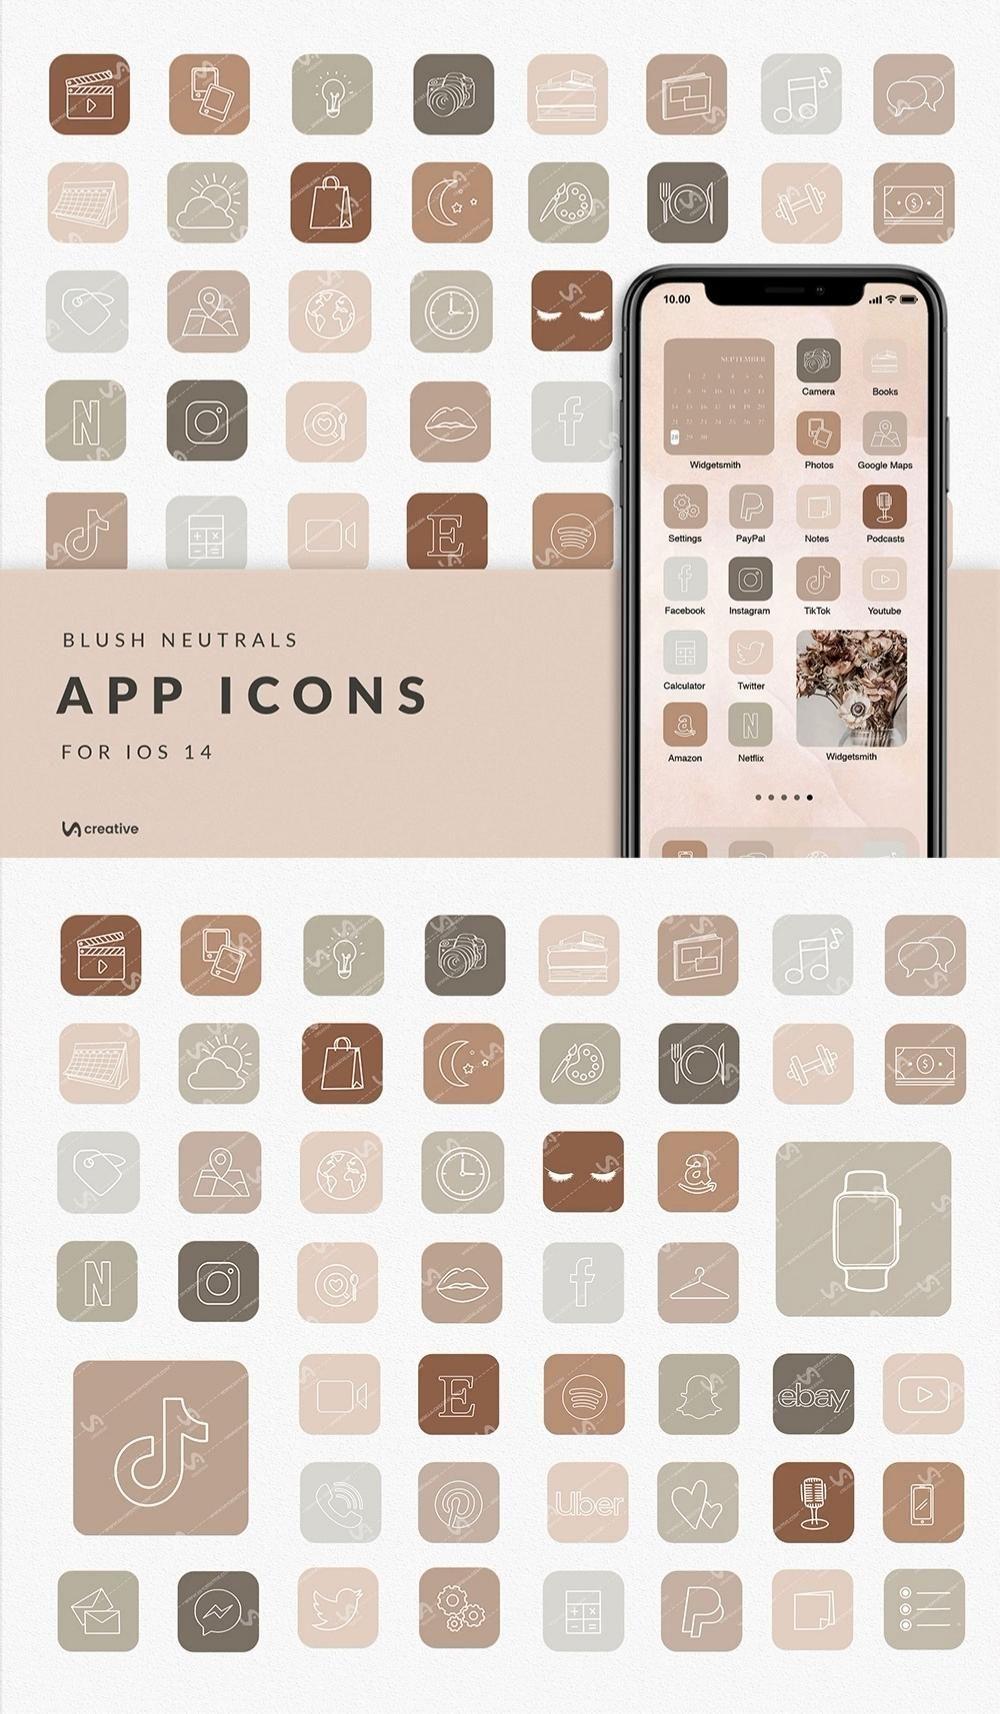 Neutral AESTHETIC | 50 iPhone iOS 14 APP ICONS | W